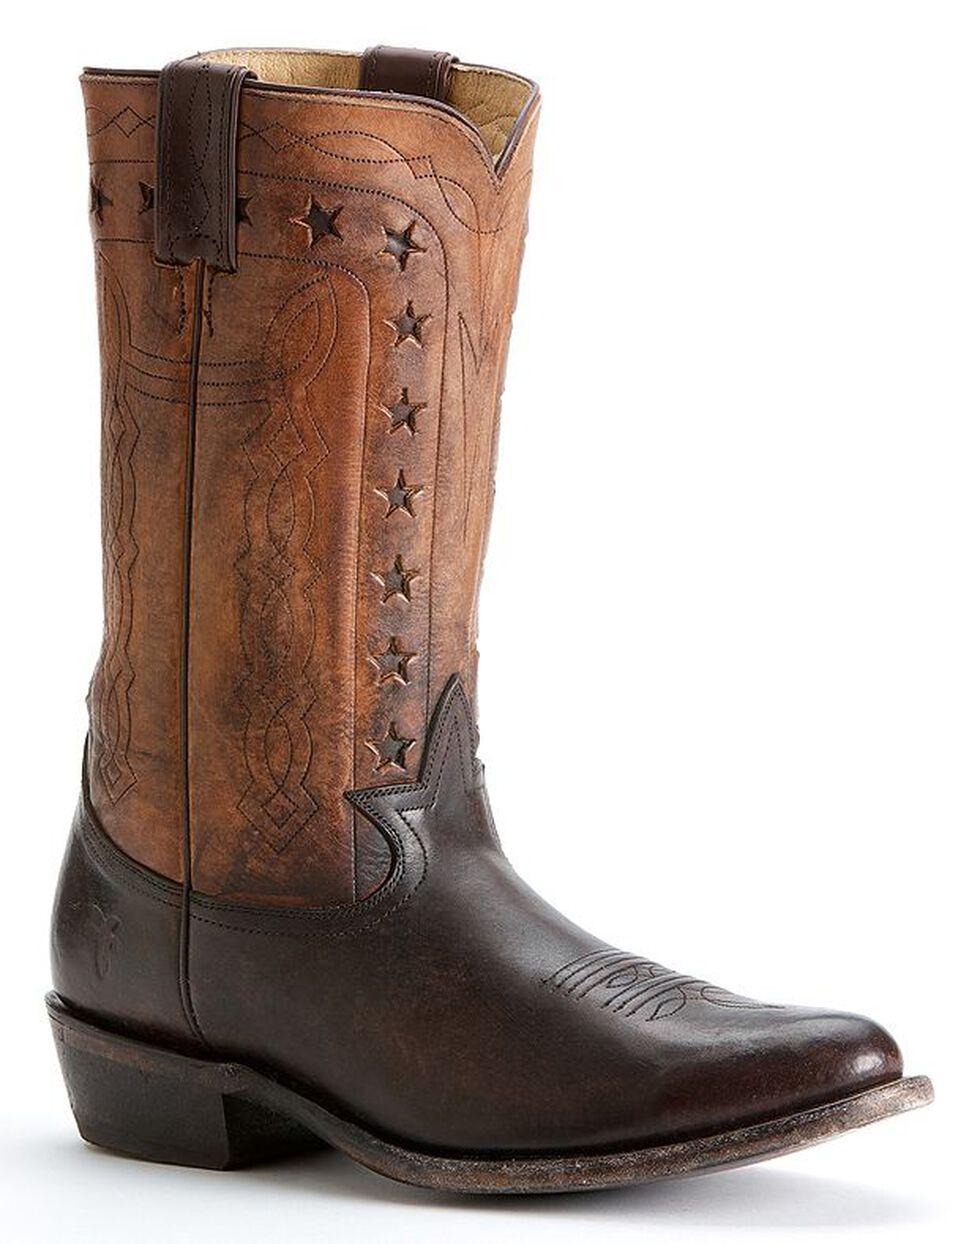 Frye Men's Wyatt Americana Cowboy Boots - Round Toe, Dark Brown, hi-res